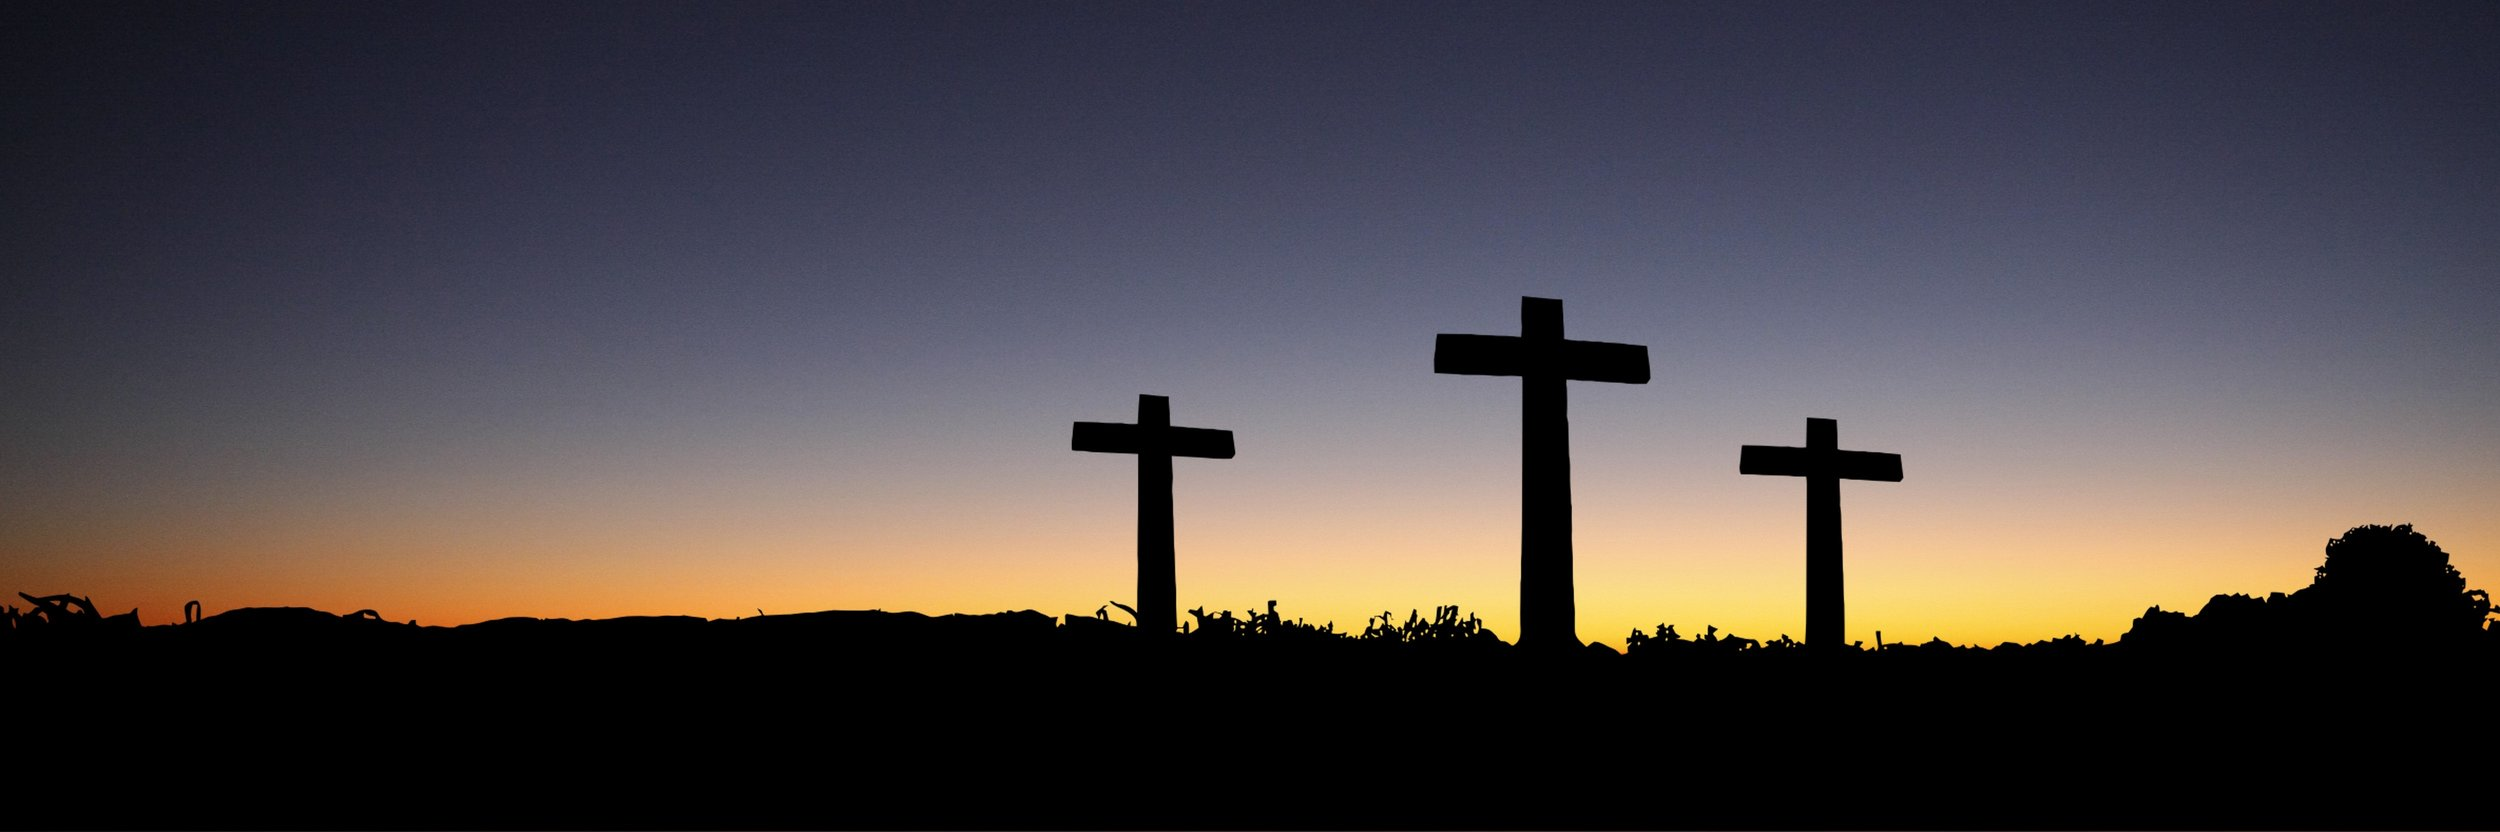 crosses-3.jpg